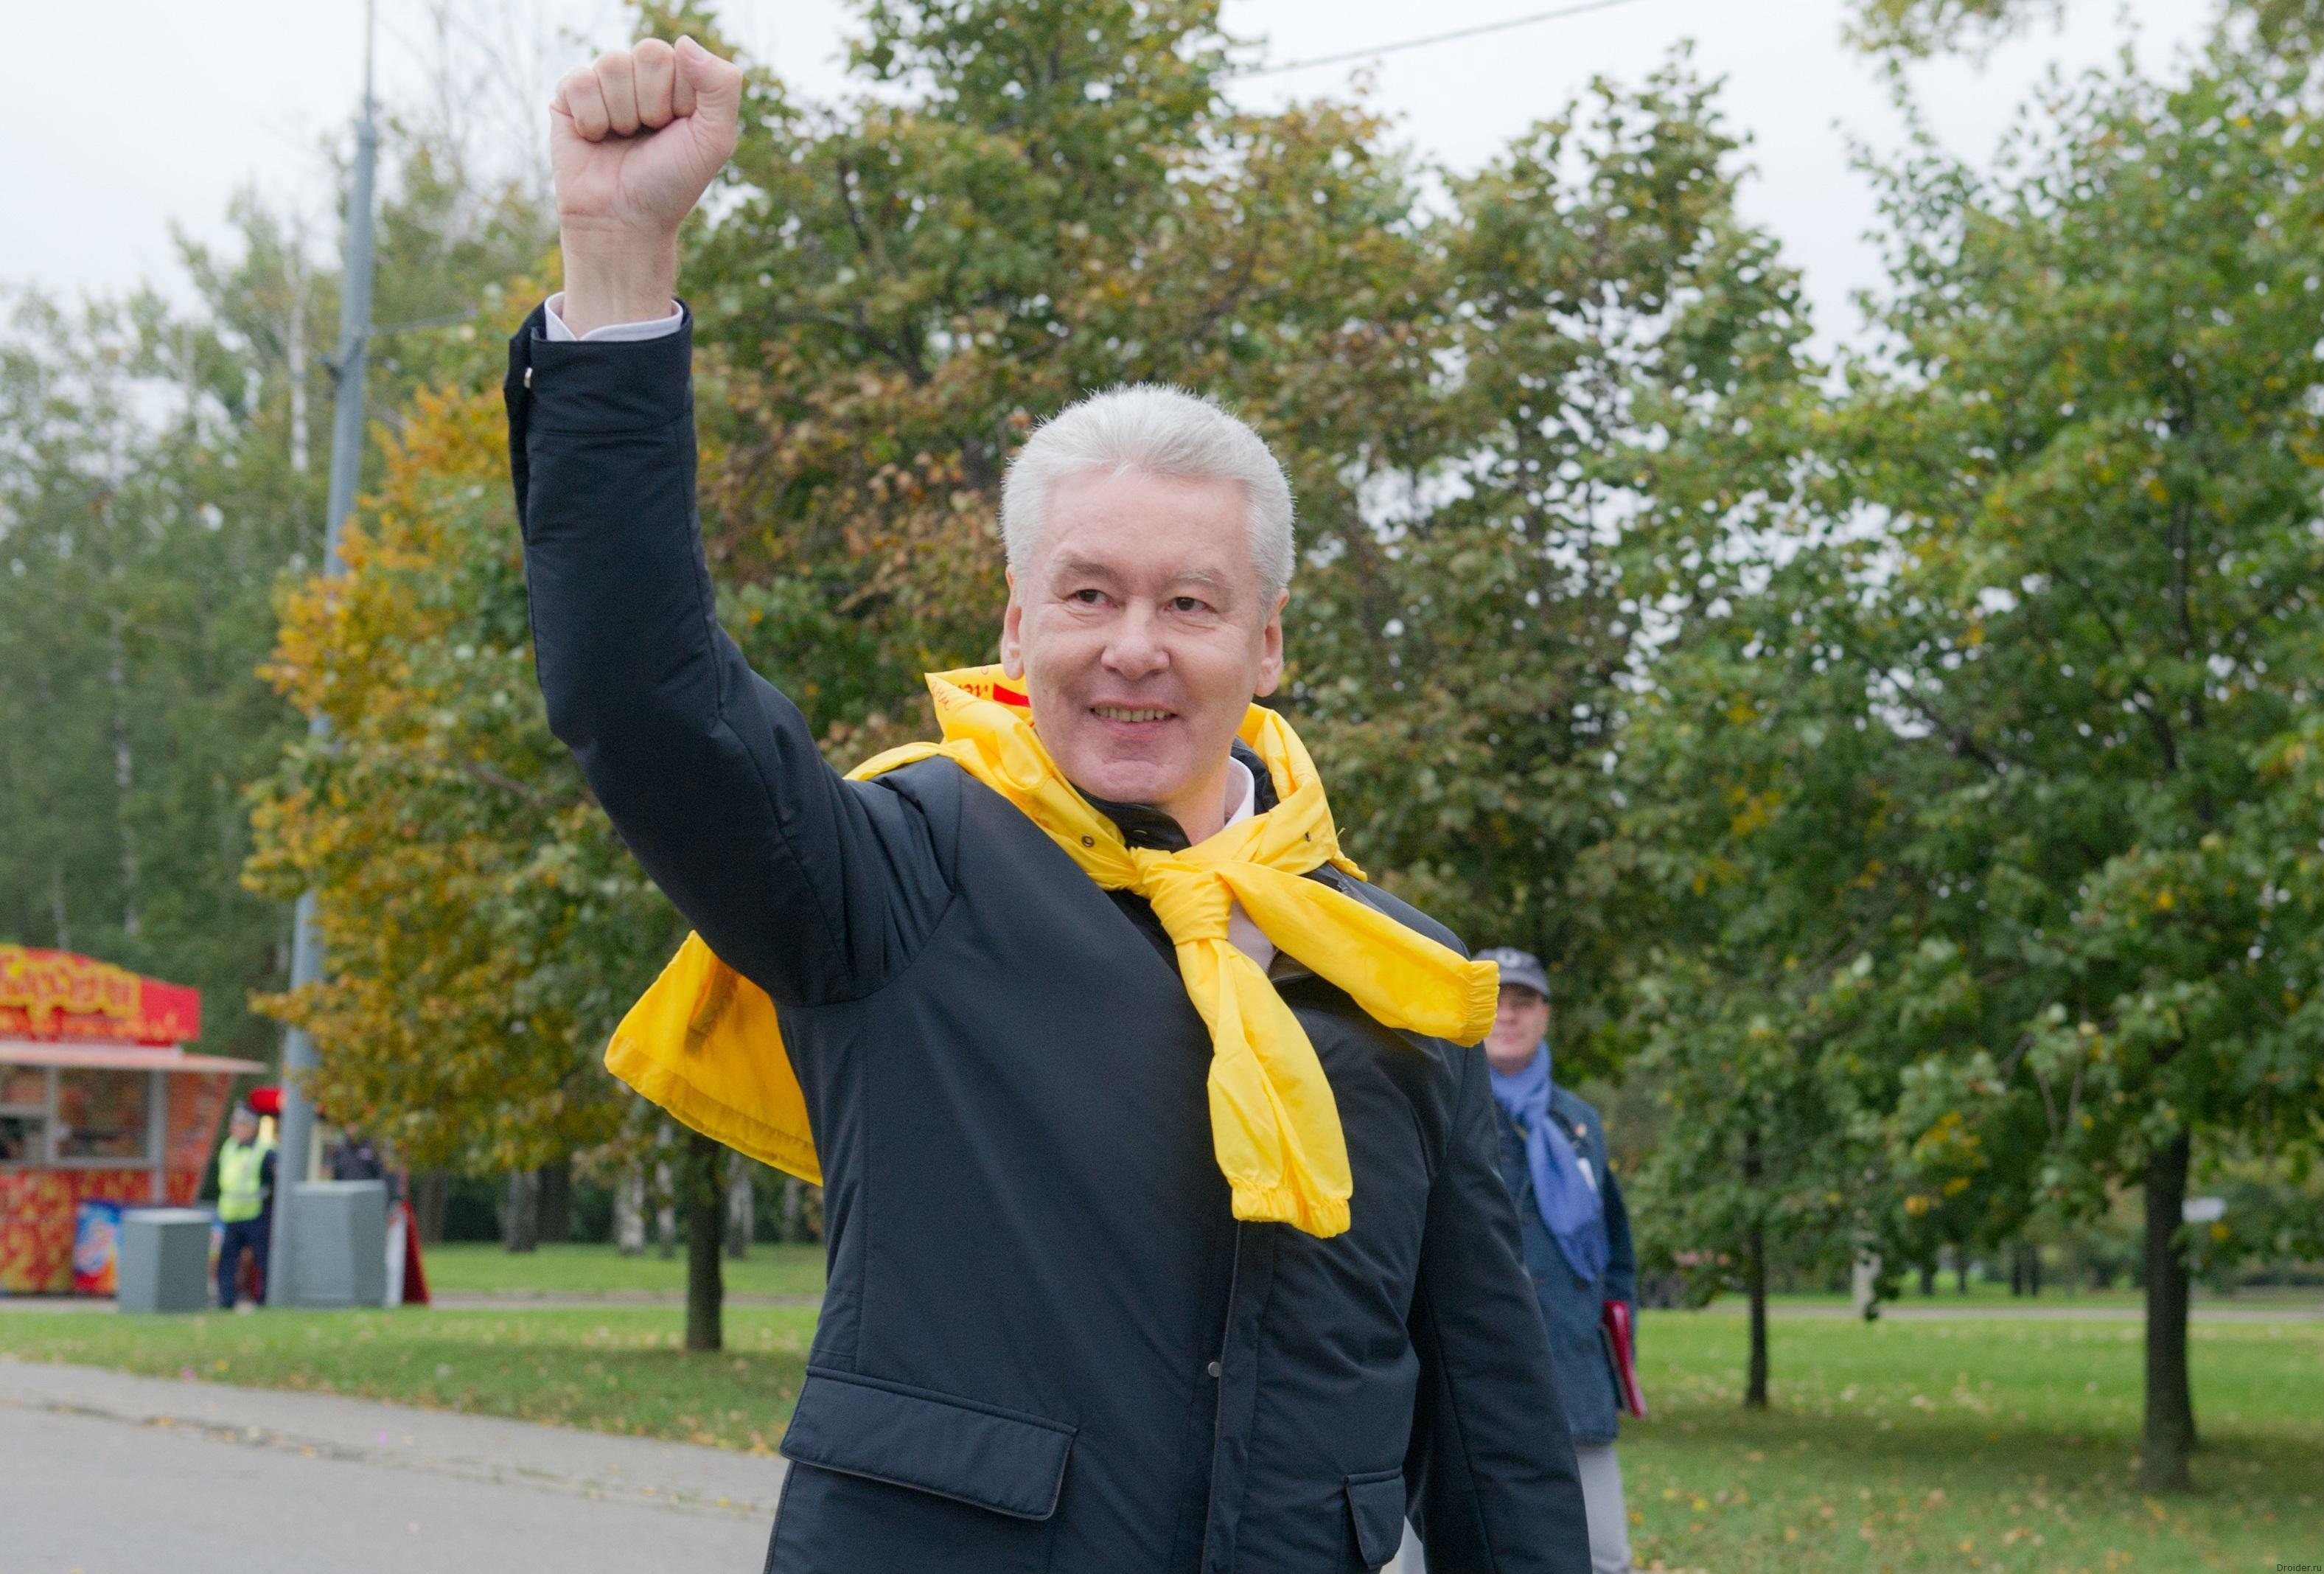 Сергей Семенович Собянин, Мэр Москвы